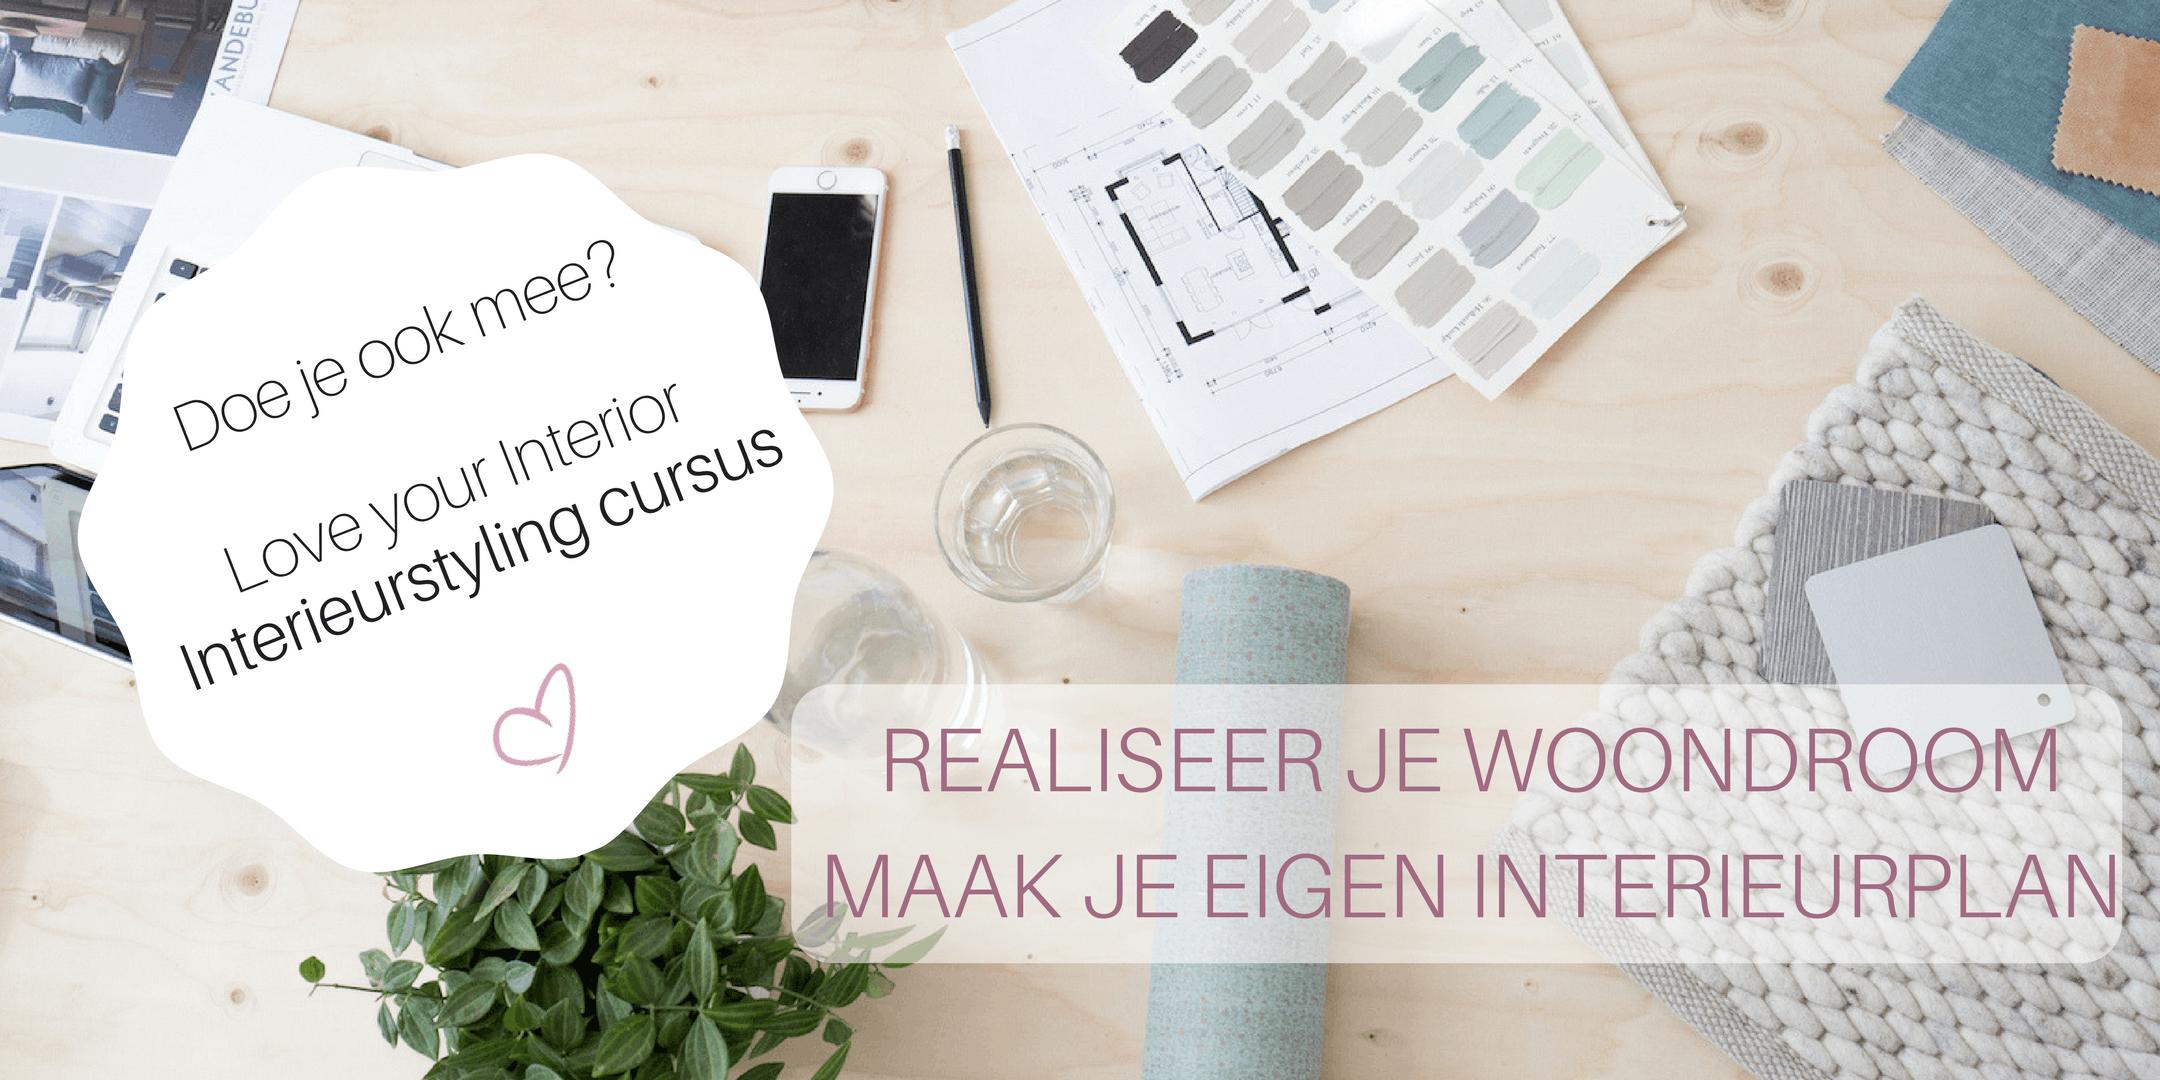 1-daagse cursus Interieurstyling Den Haag